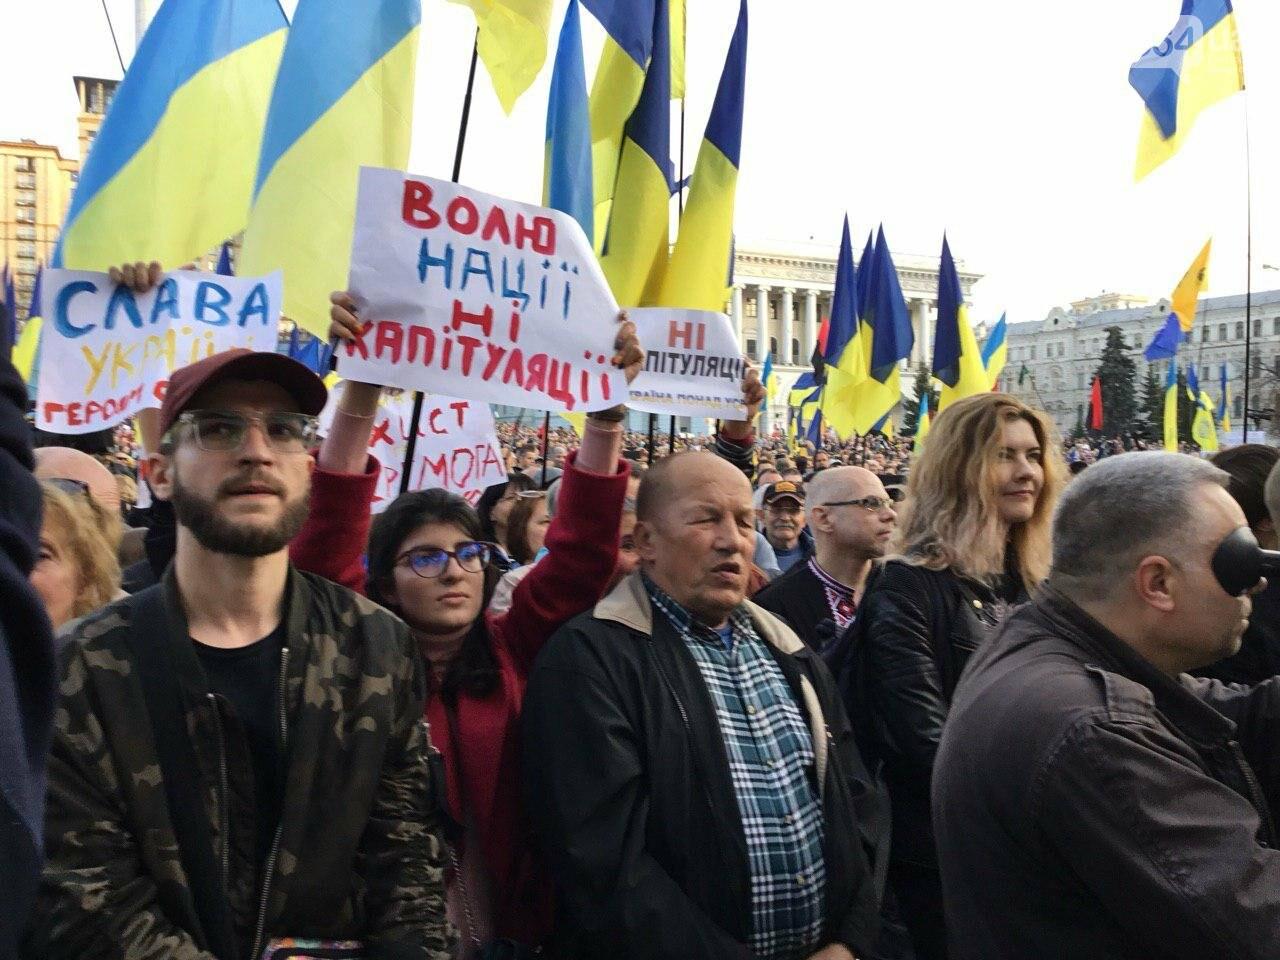 Криворожане поддержали Марш сопротивления капитуляции в Киеве, - ФОТО, ВИДЕО, ОБНОВЛЕНО, фото-37